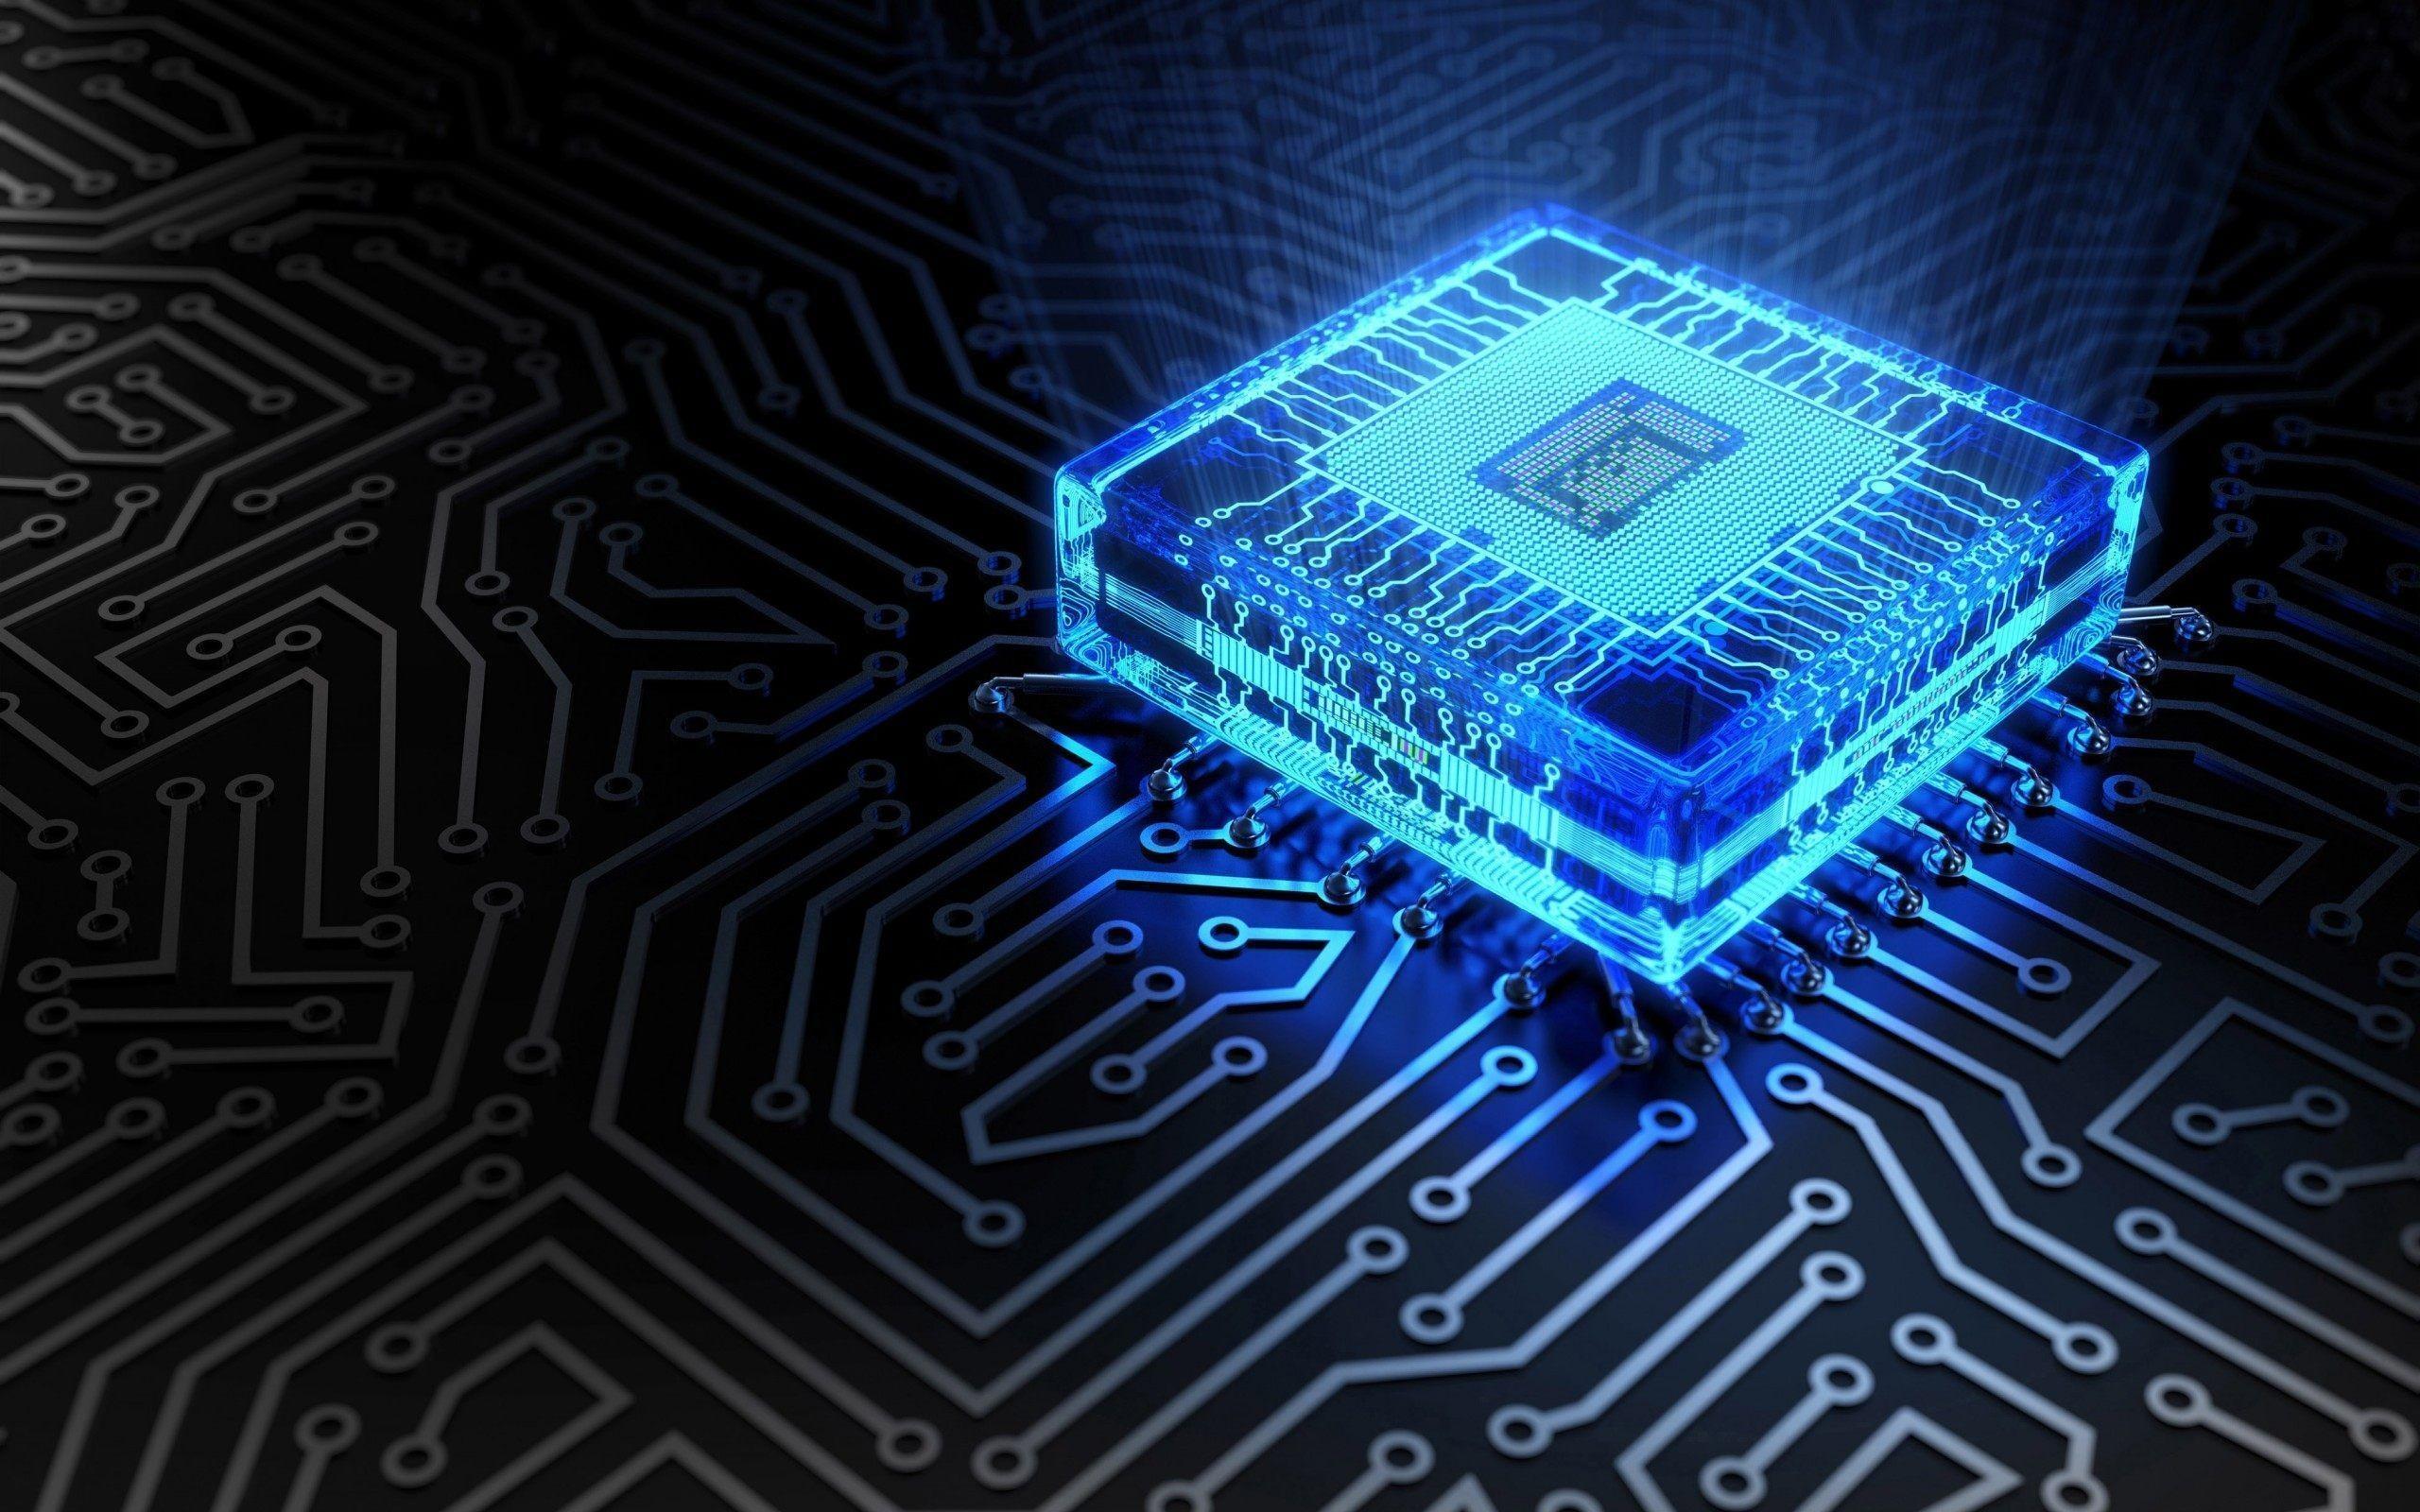 General 2560x1600 CPU tech circuit circuit boards computer technology blue cyan